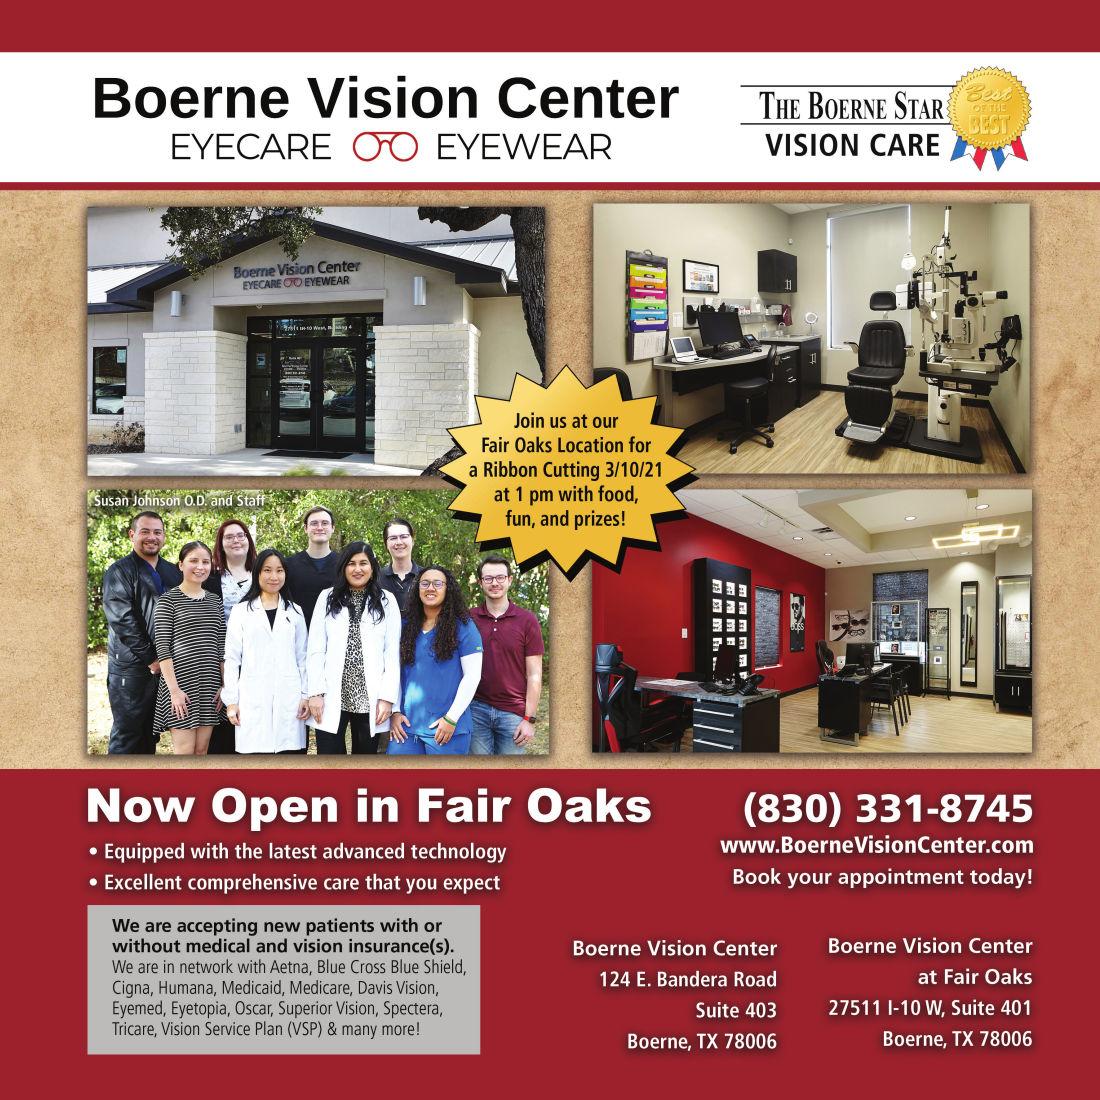 boerne-vision-center-at-fair-oaks-ribbon-cutting-1